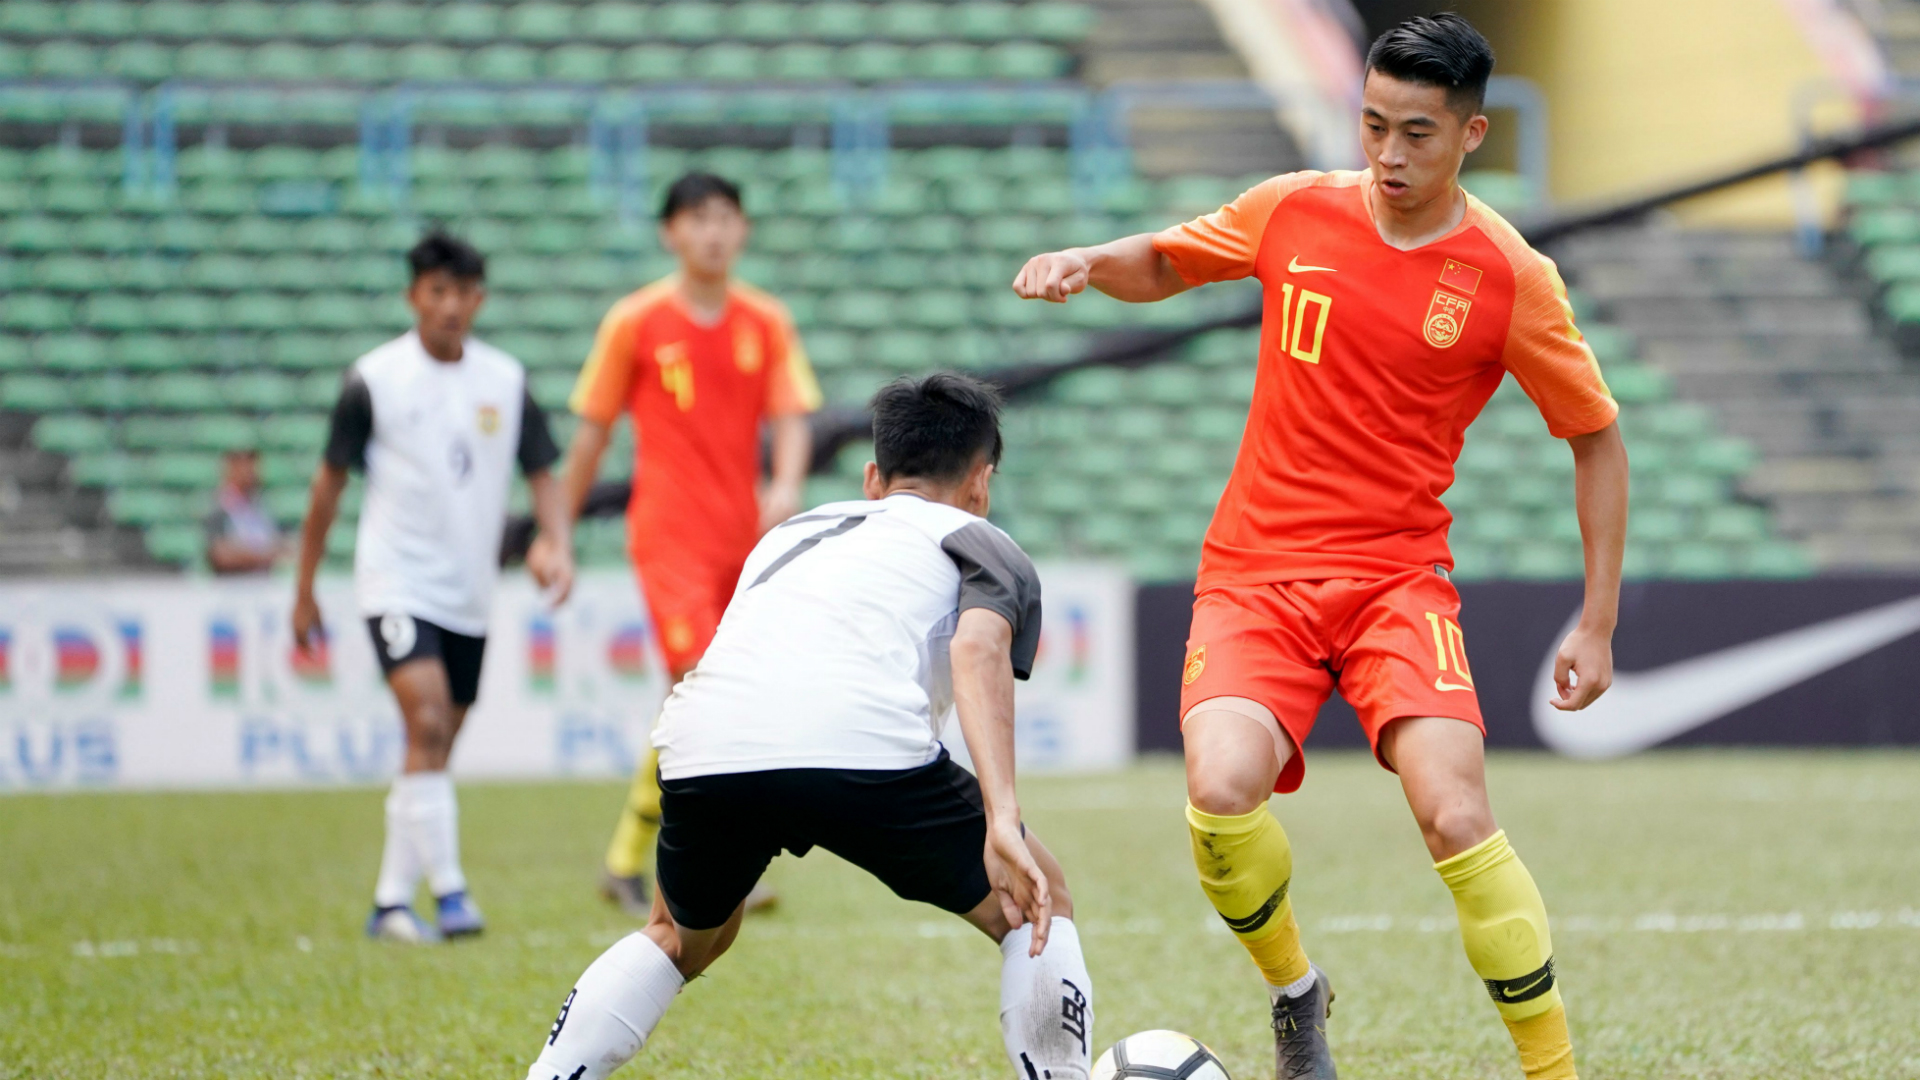 China U23 v Laos U23, AFC U23 Championship, 22 Mar 2019